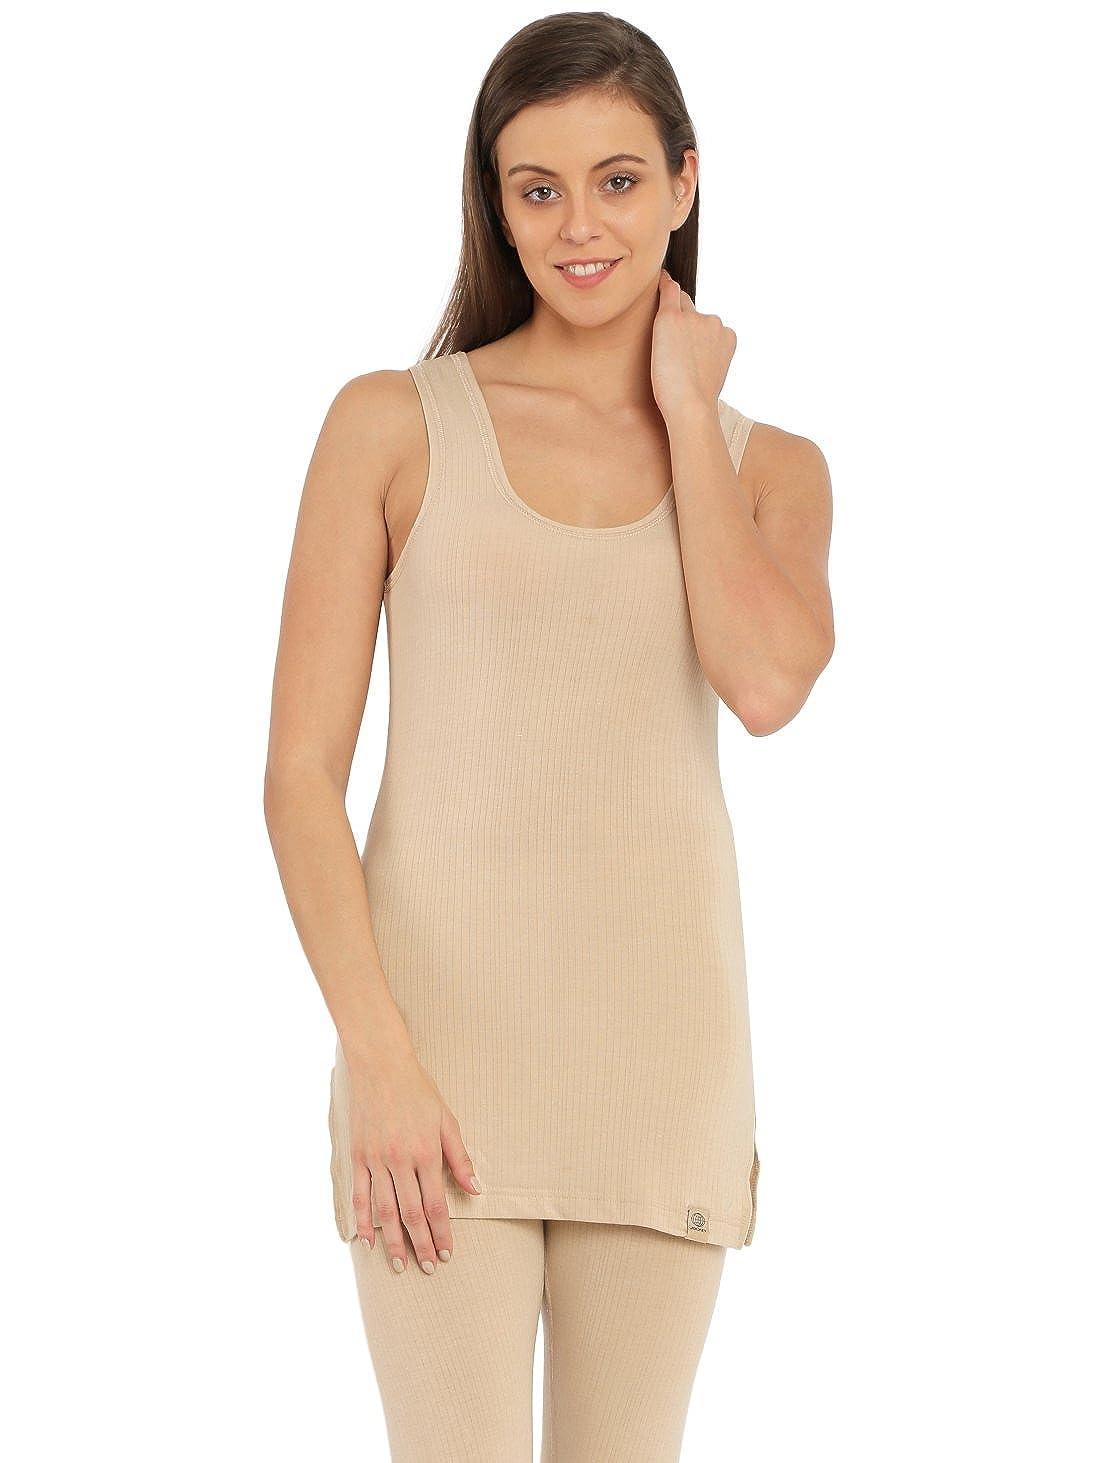 8afc10e5e6 Jockey Women s Thermal Top (2508-0105-TSKIN Small)  Amazon.in  Clothing    Accessories